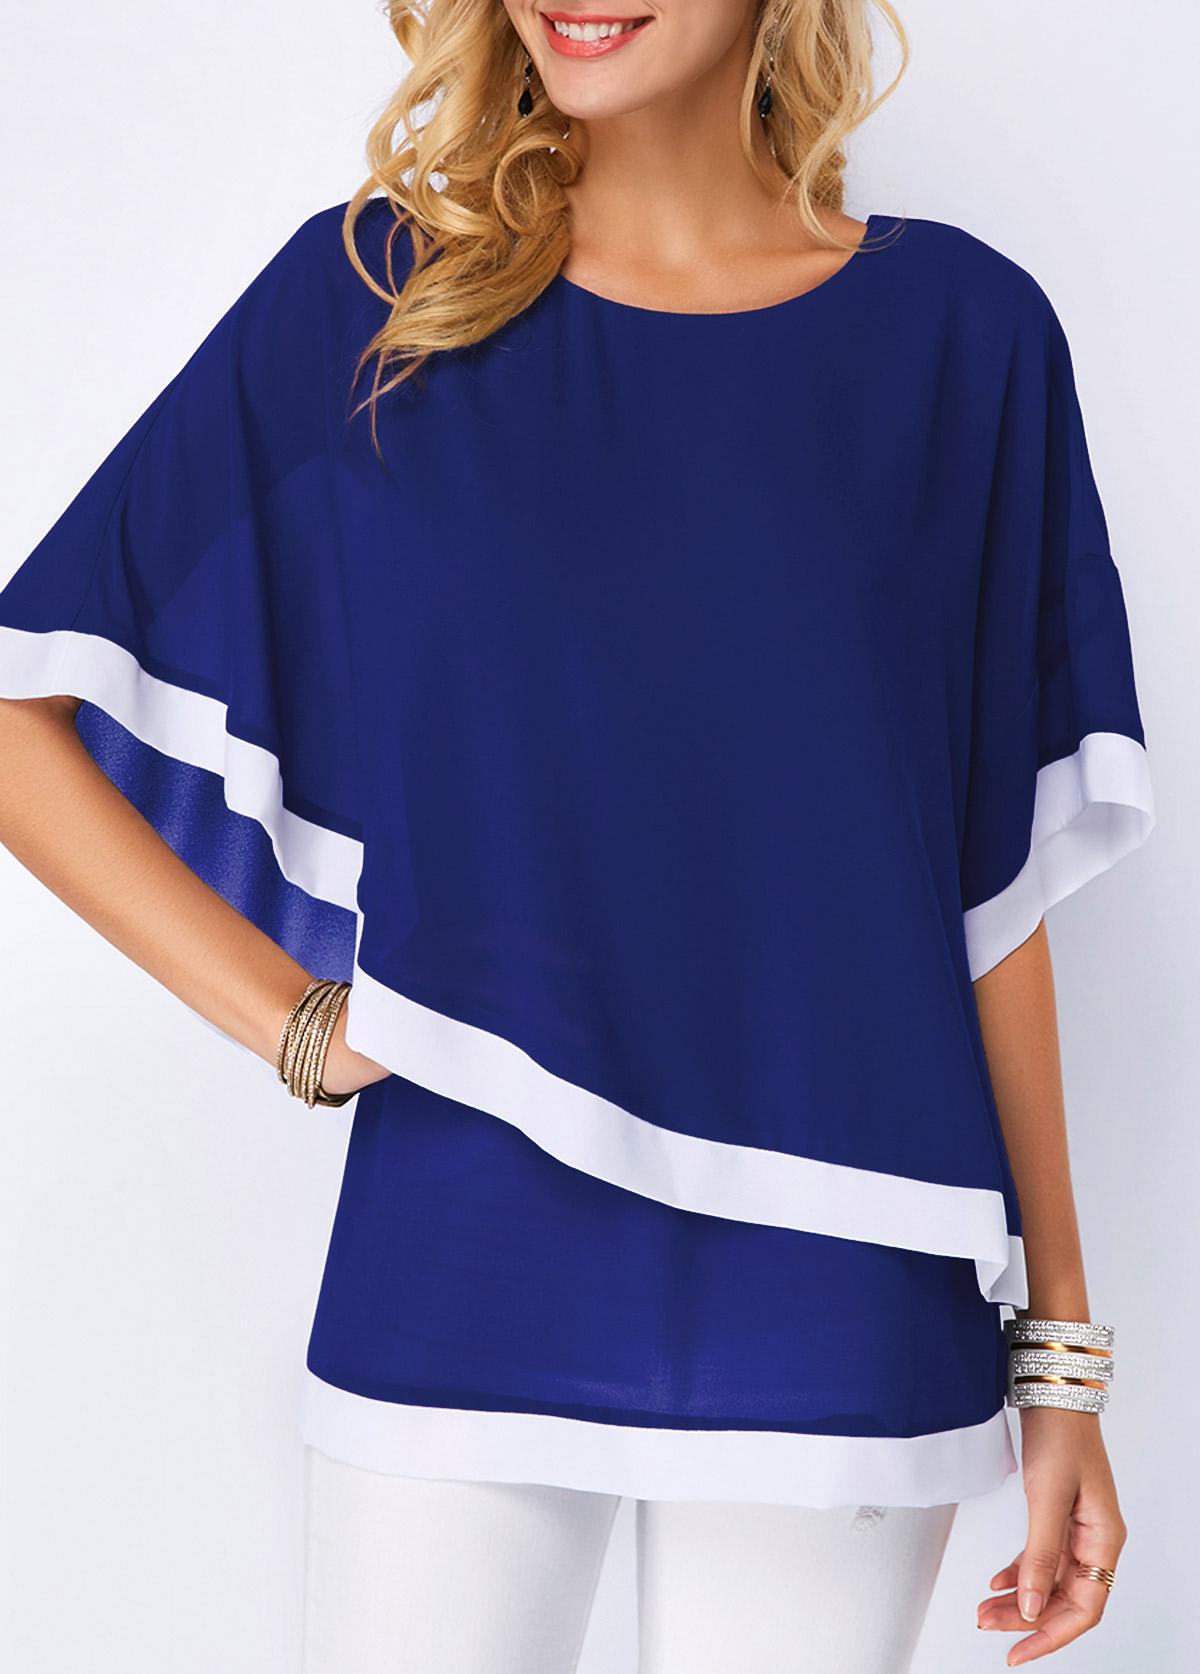 5f949010 Chiffon Overlay Half Sleeve Navy Blue Blouse | Rosewe.com - USD $30.94